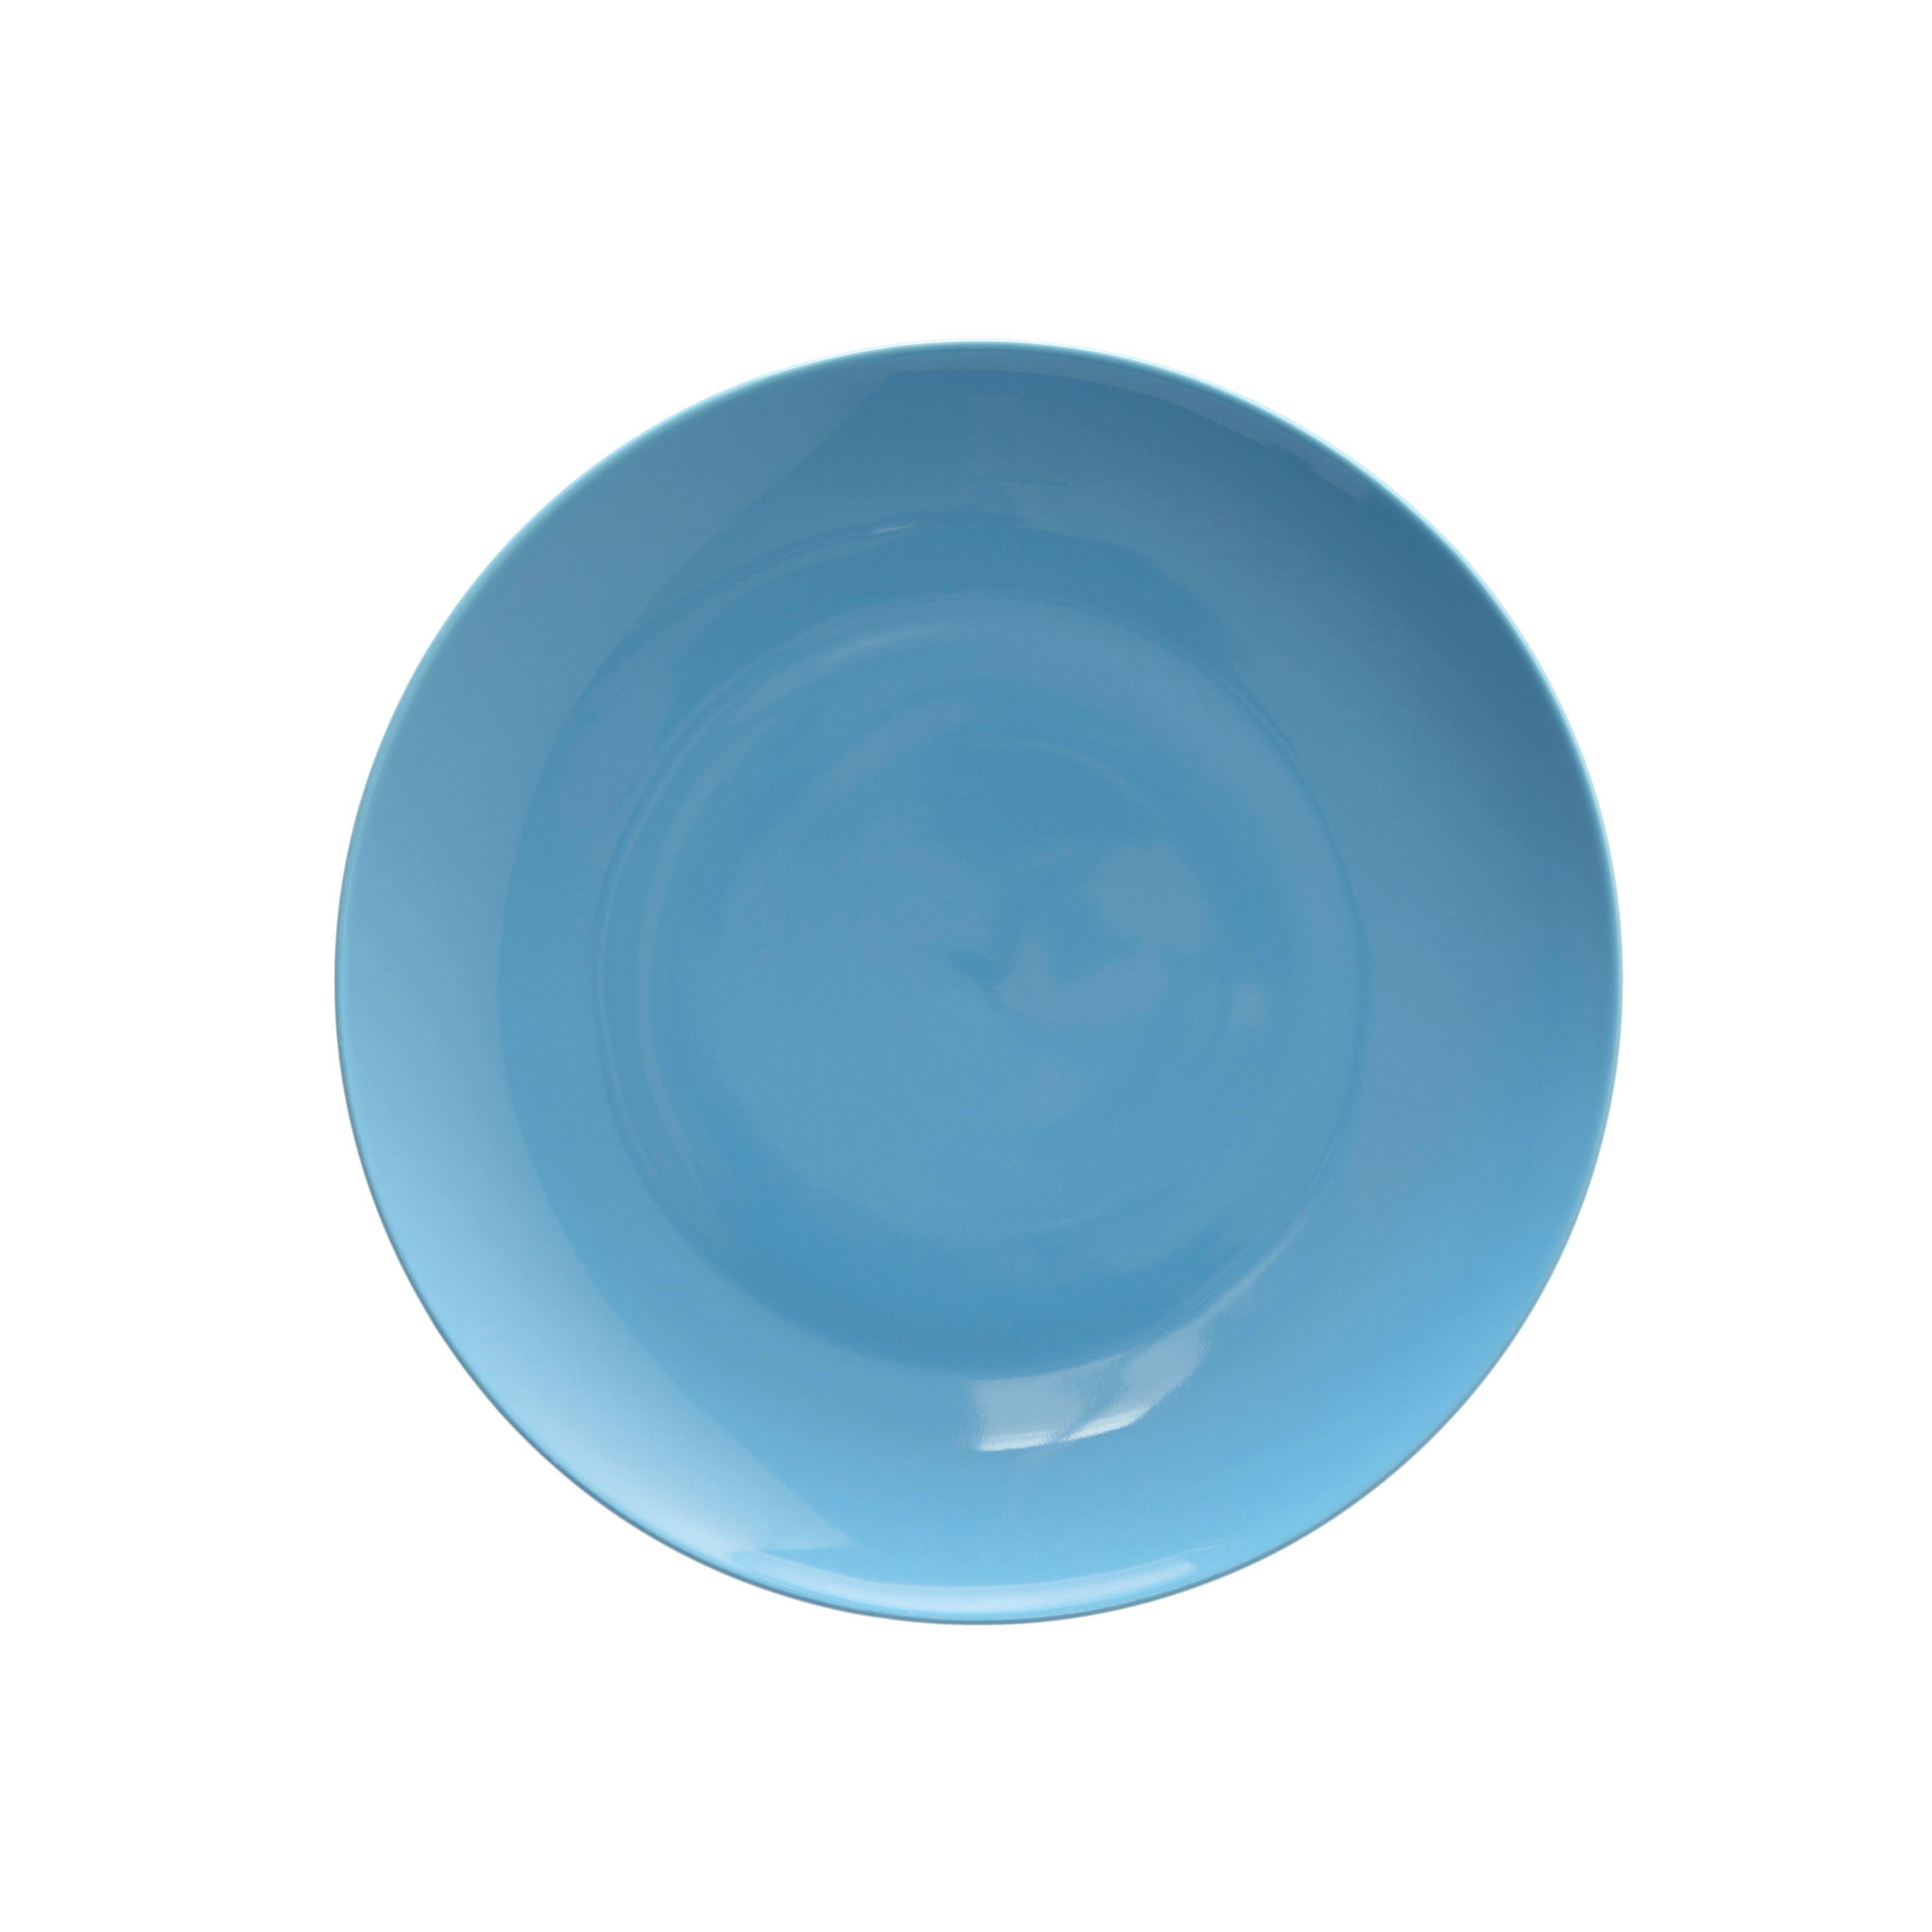 Dessertteller Sandy - Türkis, KONVENTIONELL, Keramik (20,4/1,8cm) - MÖMAX modern living